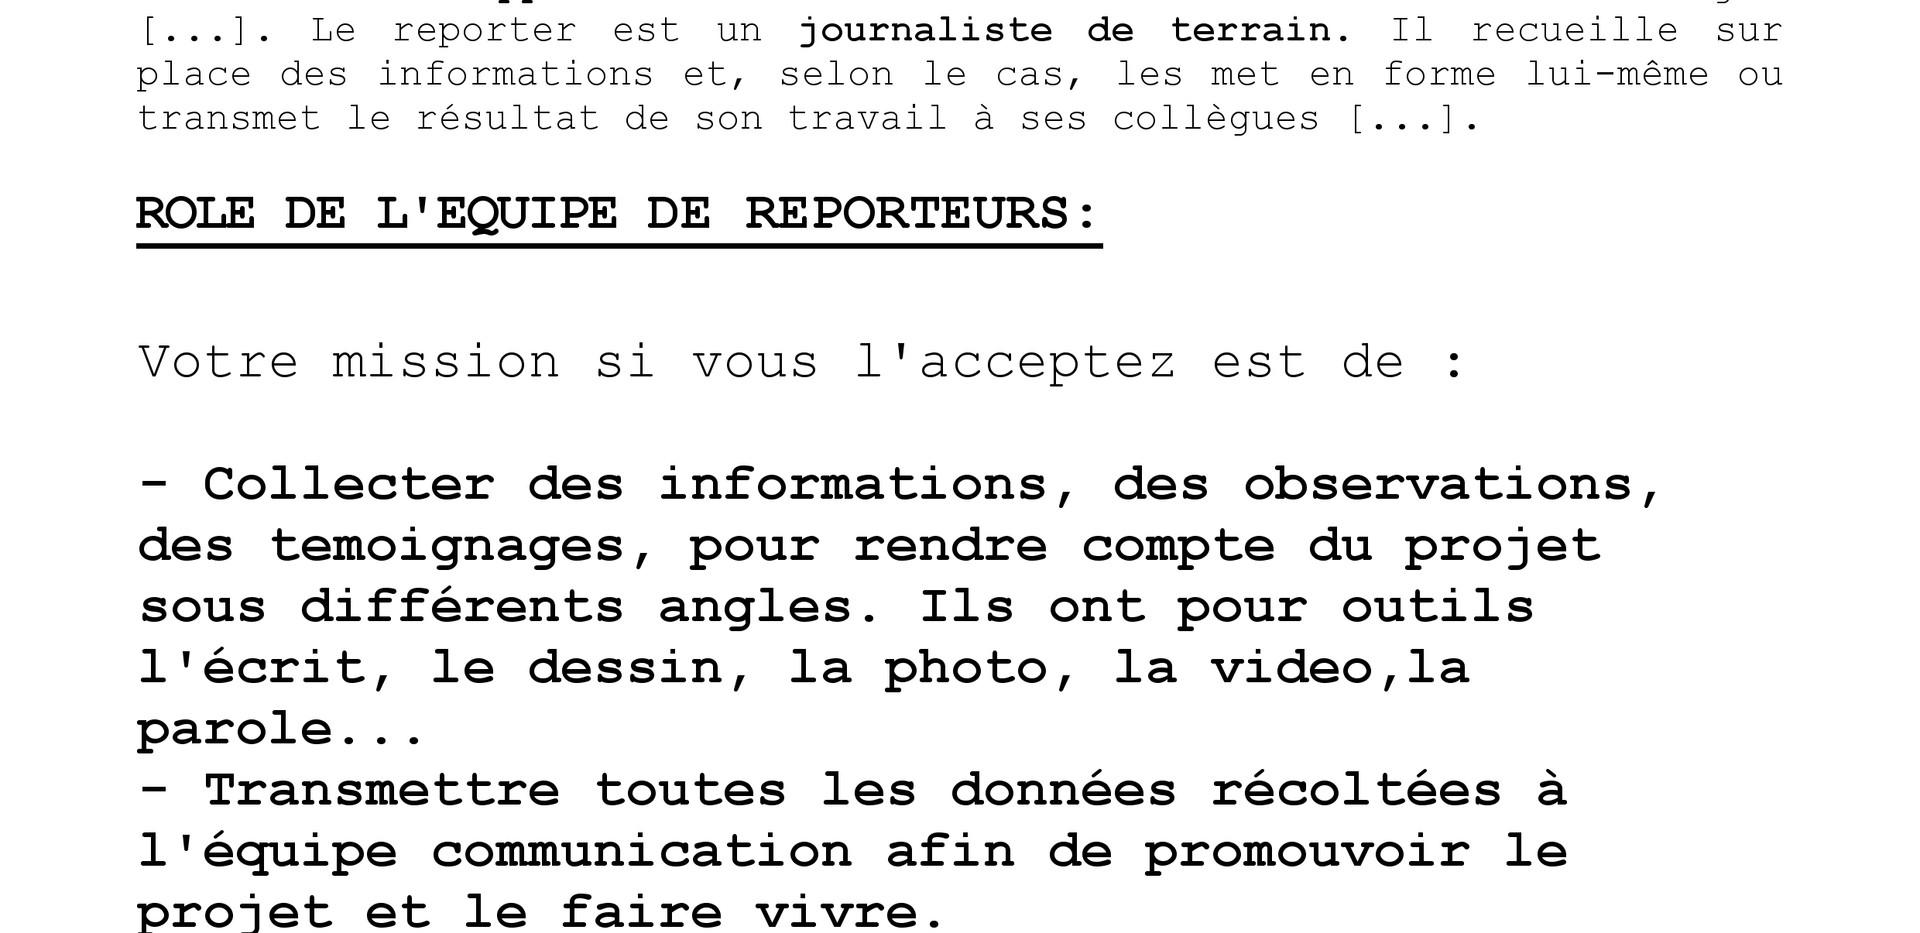 fiche REPORTERS.jpeg